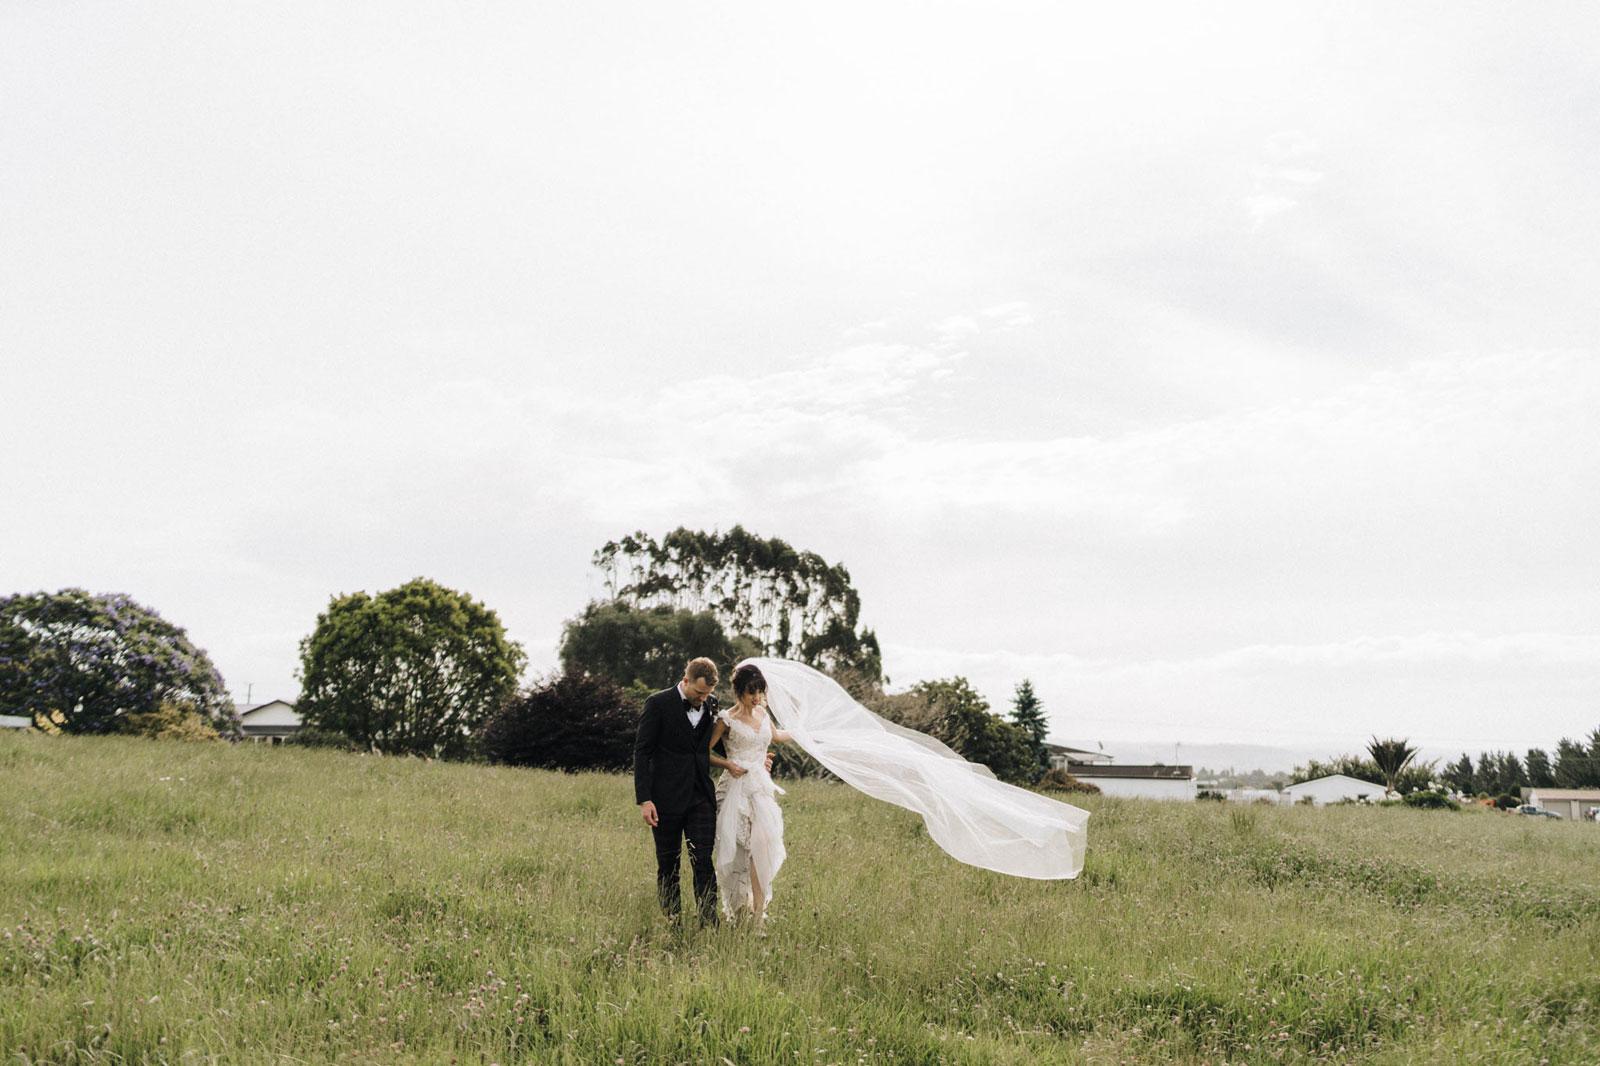 newfound-n-c-olive-tree-cottage-tauranga-wedding-photographer-697